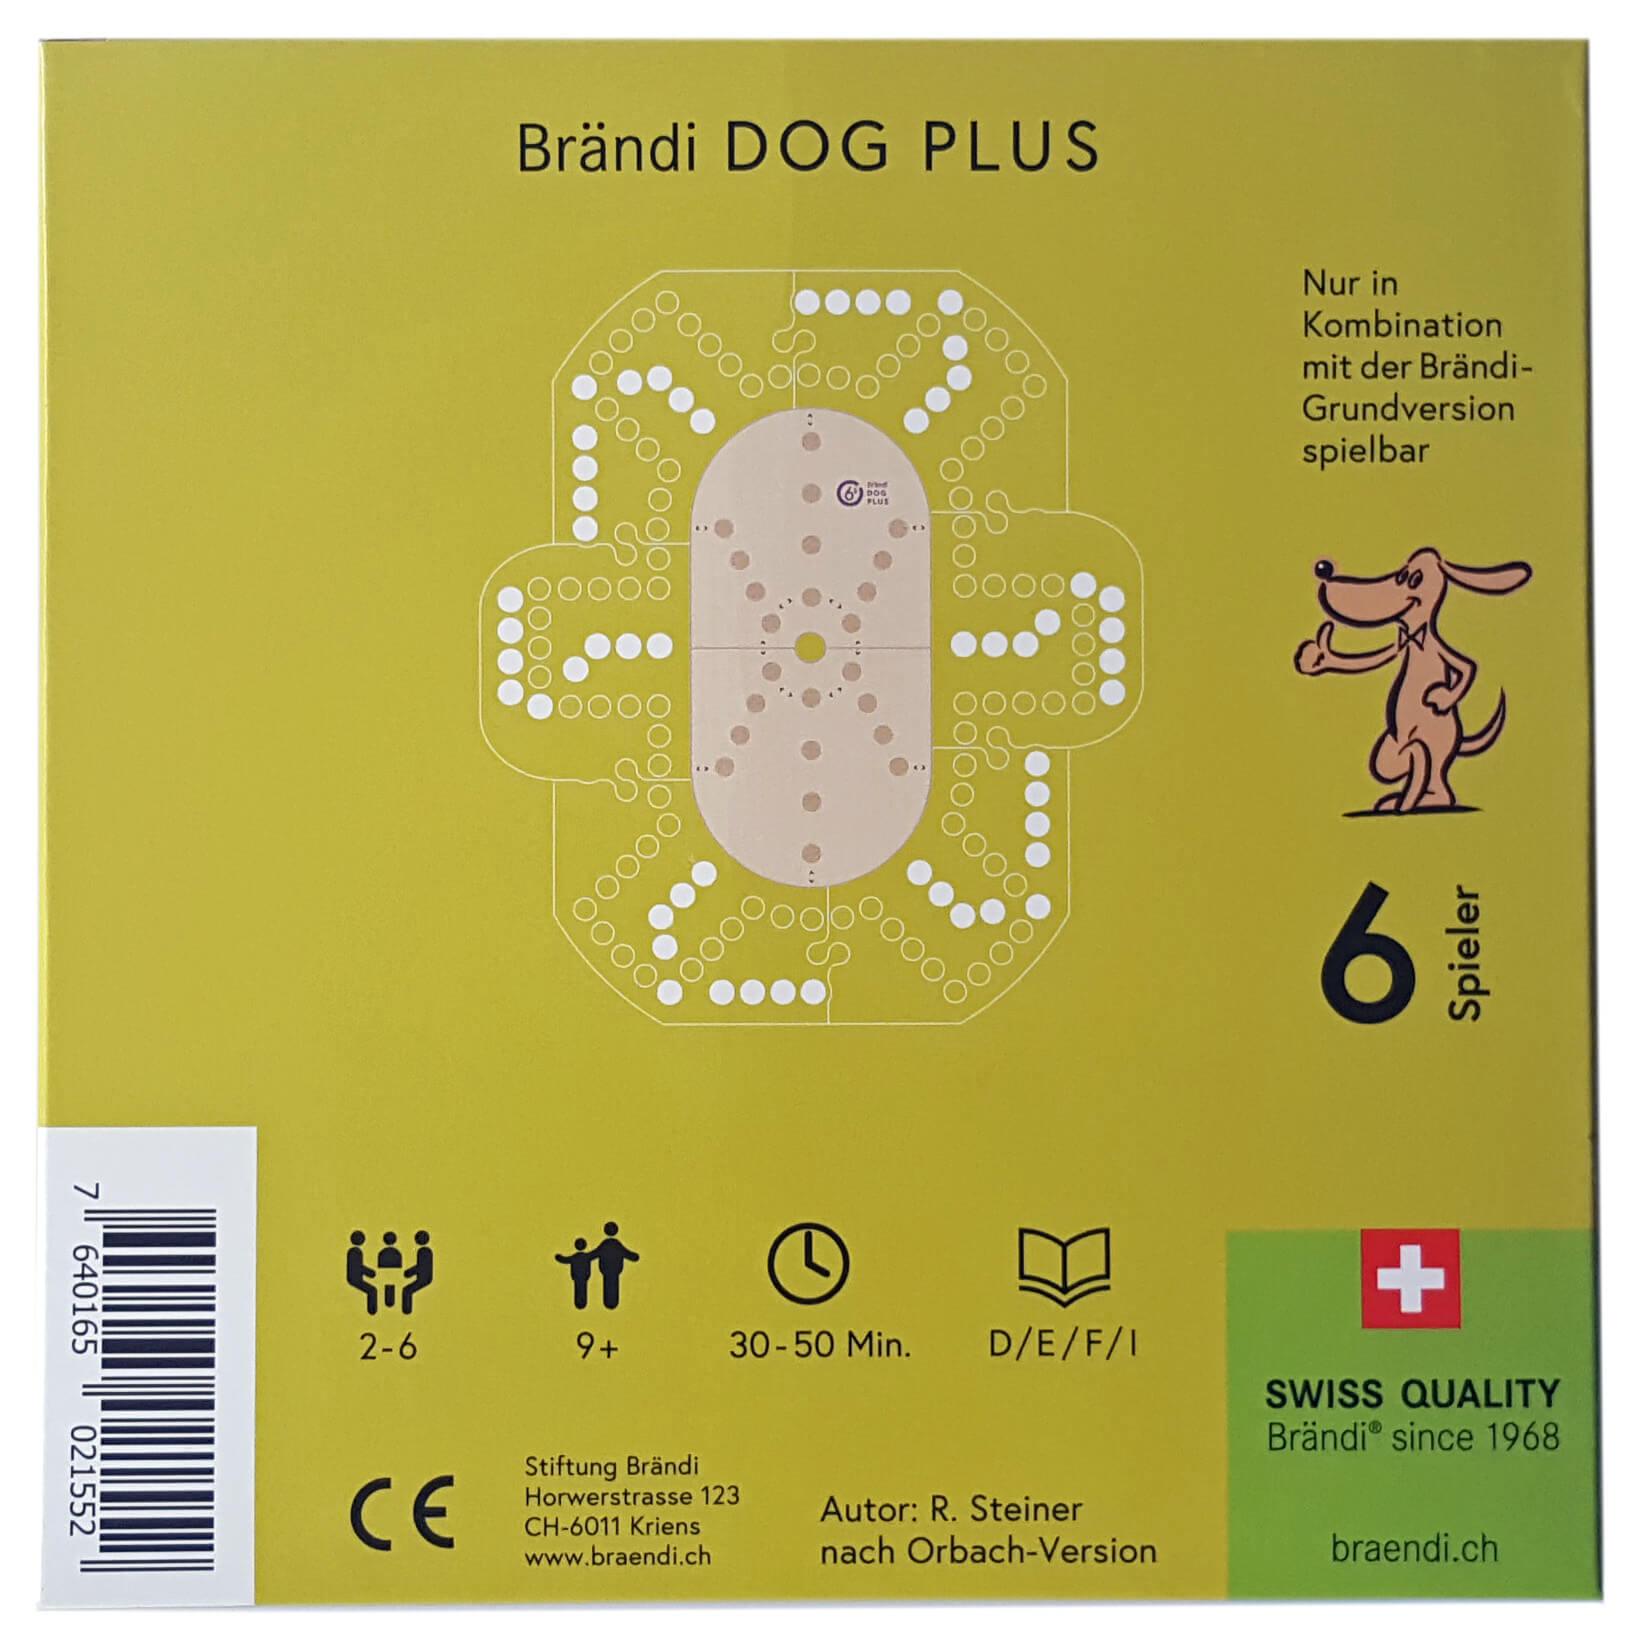 Schachtel Rückseite- Brändi Dog Plus per 6 giocatore